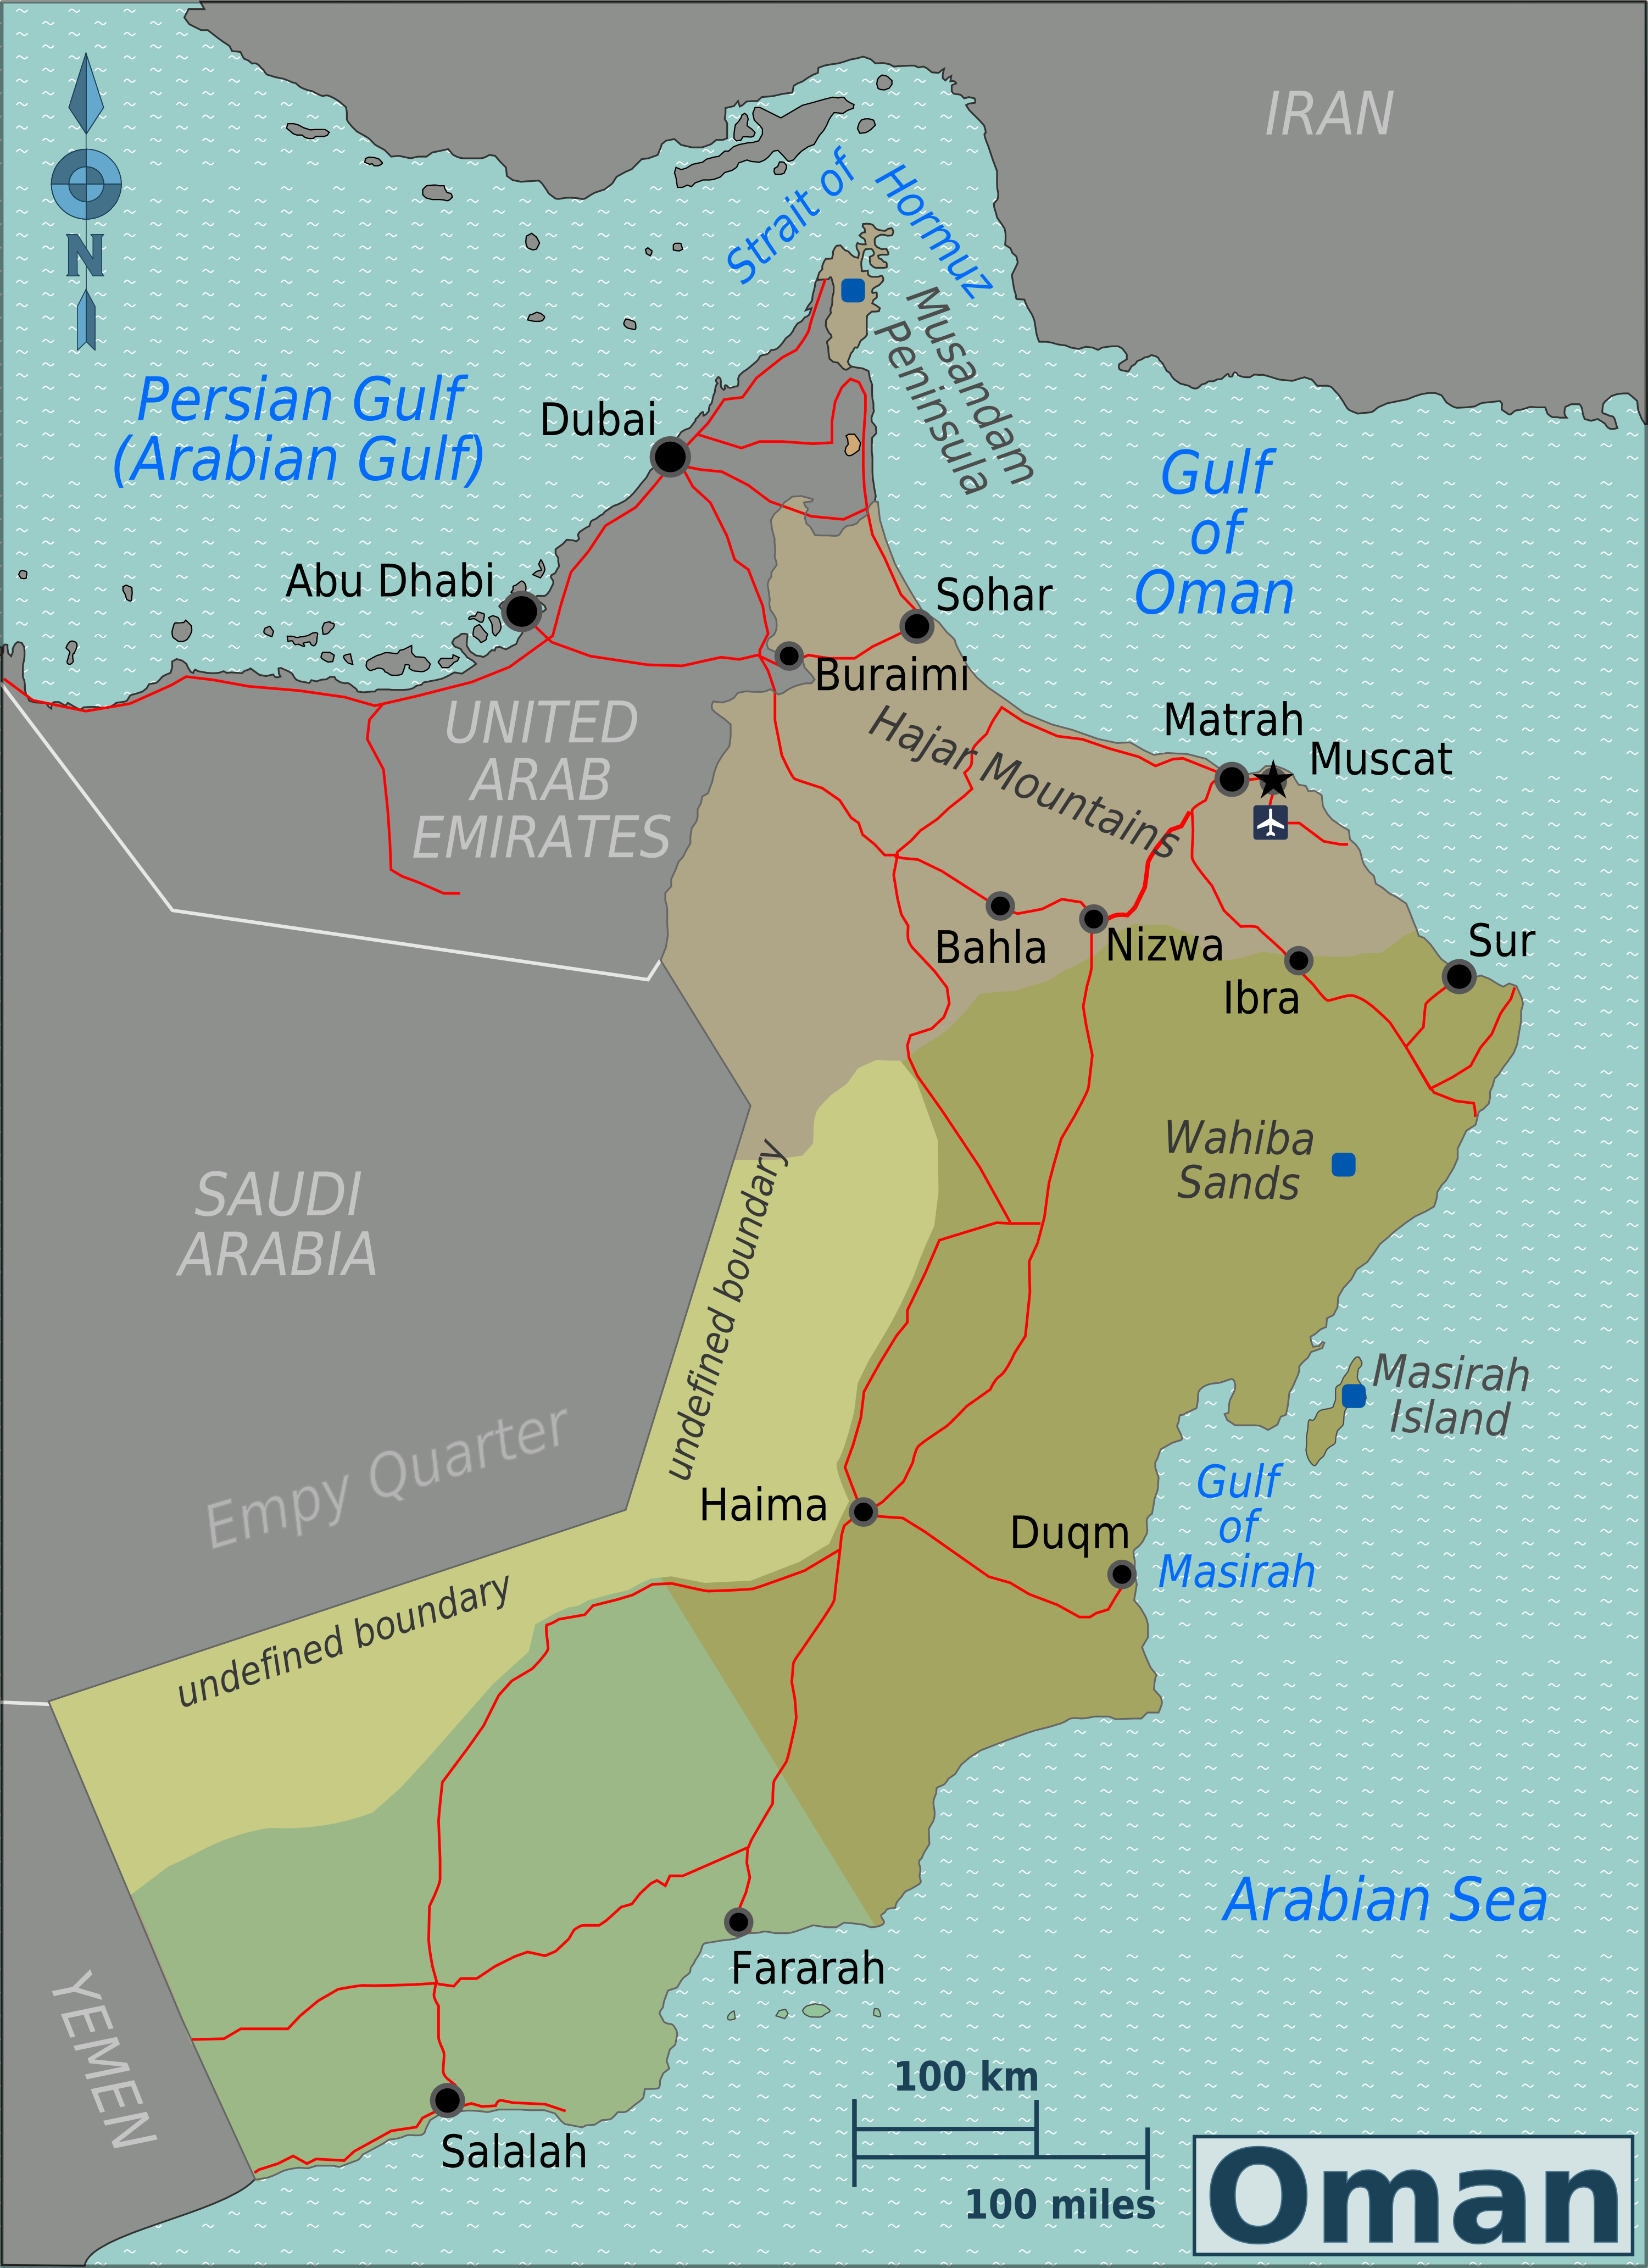 Karte Oman.Landkarte Oman übersichtskarte Regionen Weltkarte Com Karten